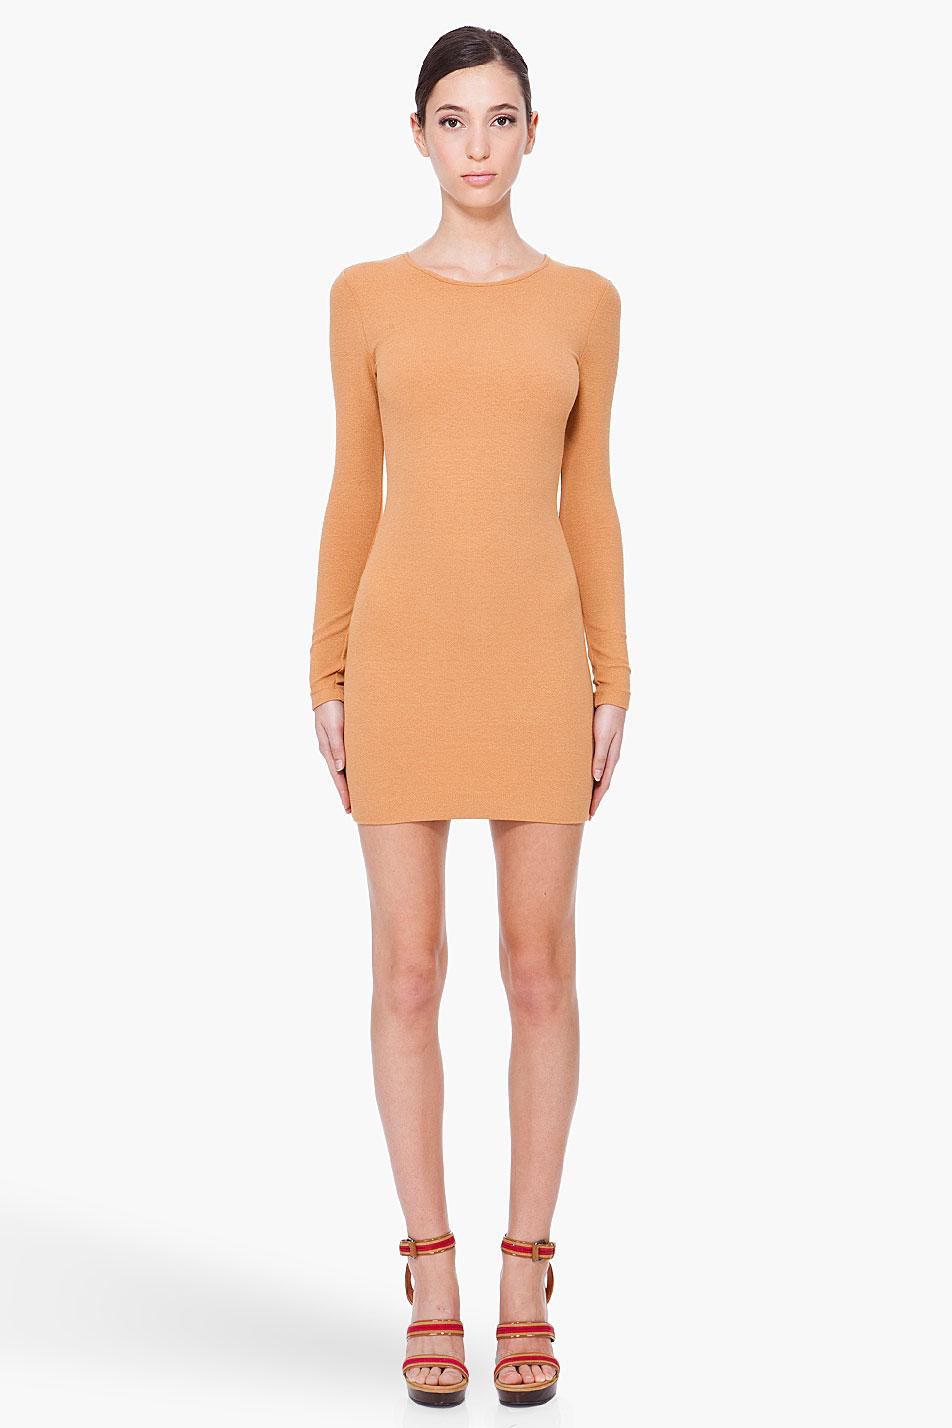 kimberly ovitz aisu dress in orange lyst